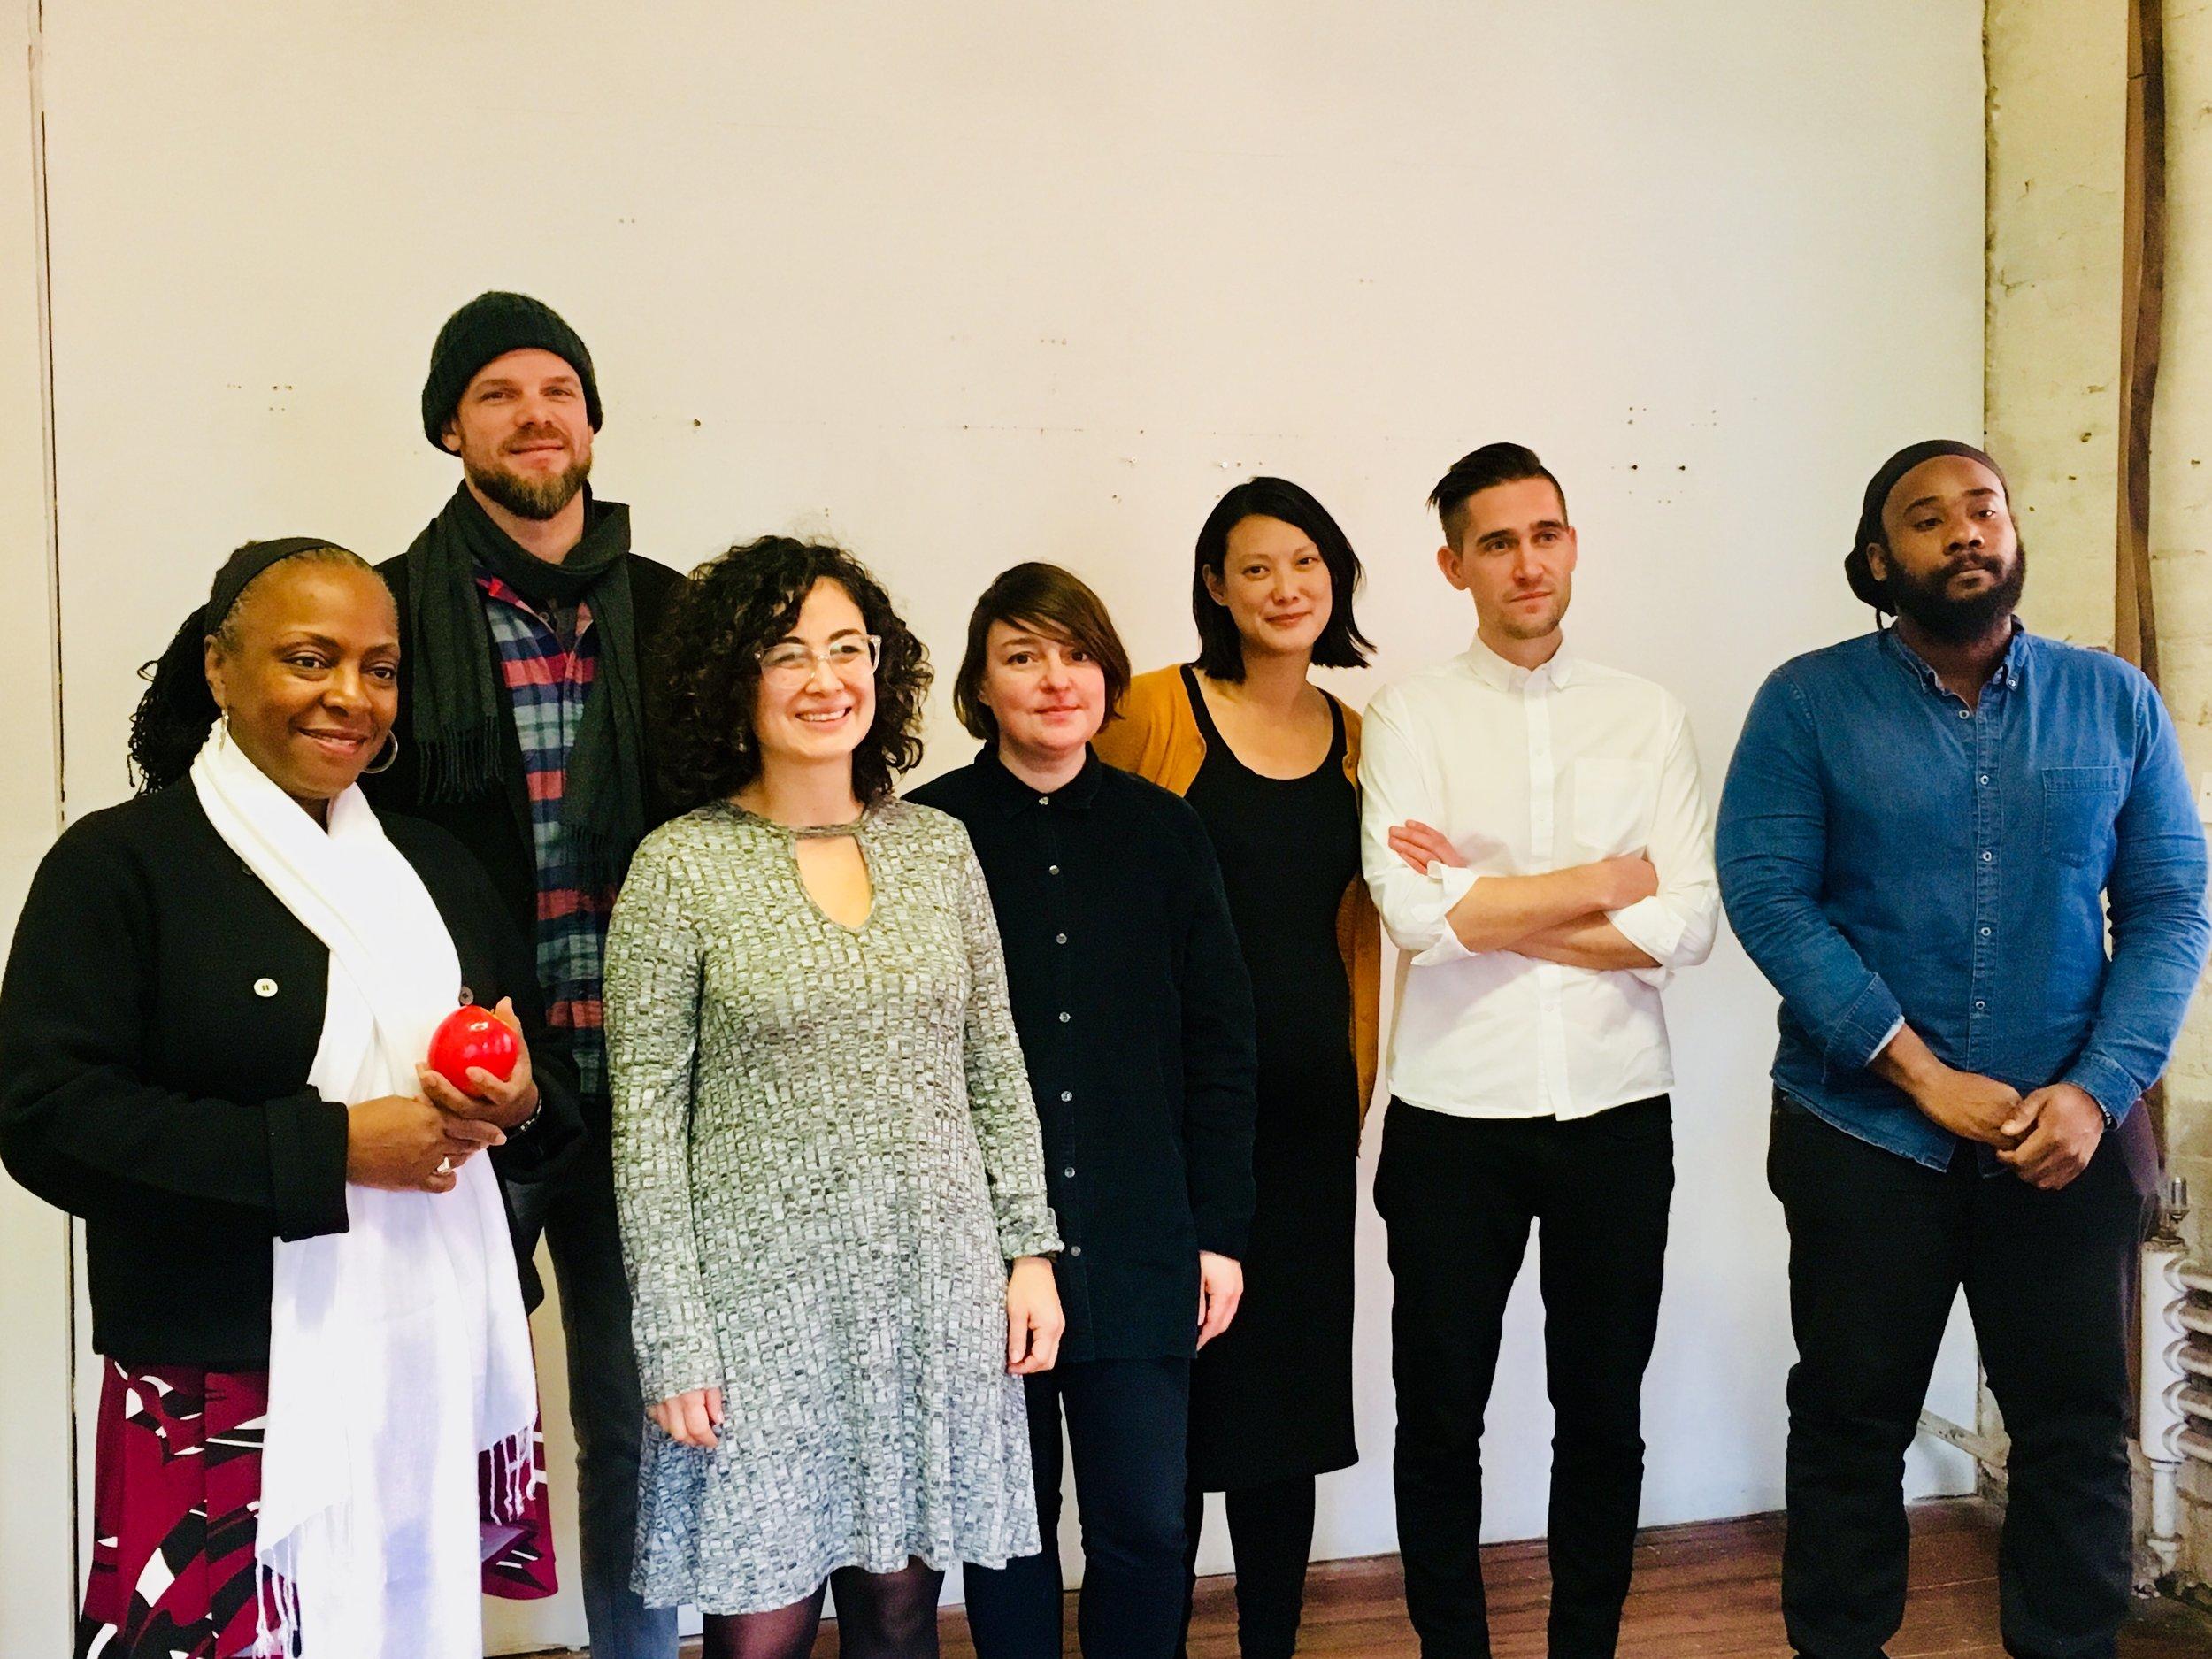 2018 N+T Accelerator artists from L to R: Ekua Holmes, Ryan Edwards, Lina Maria Geraldo, Katarina Burin, Cynthia Gunadi, Joel Lamere, Stephen Hamilton.